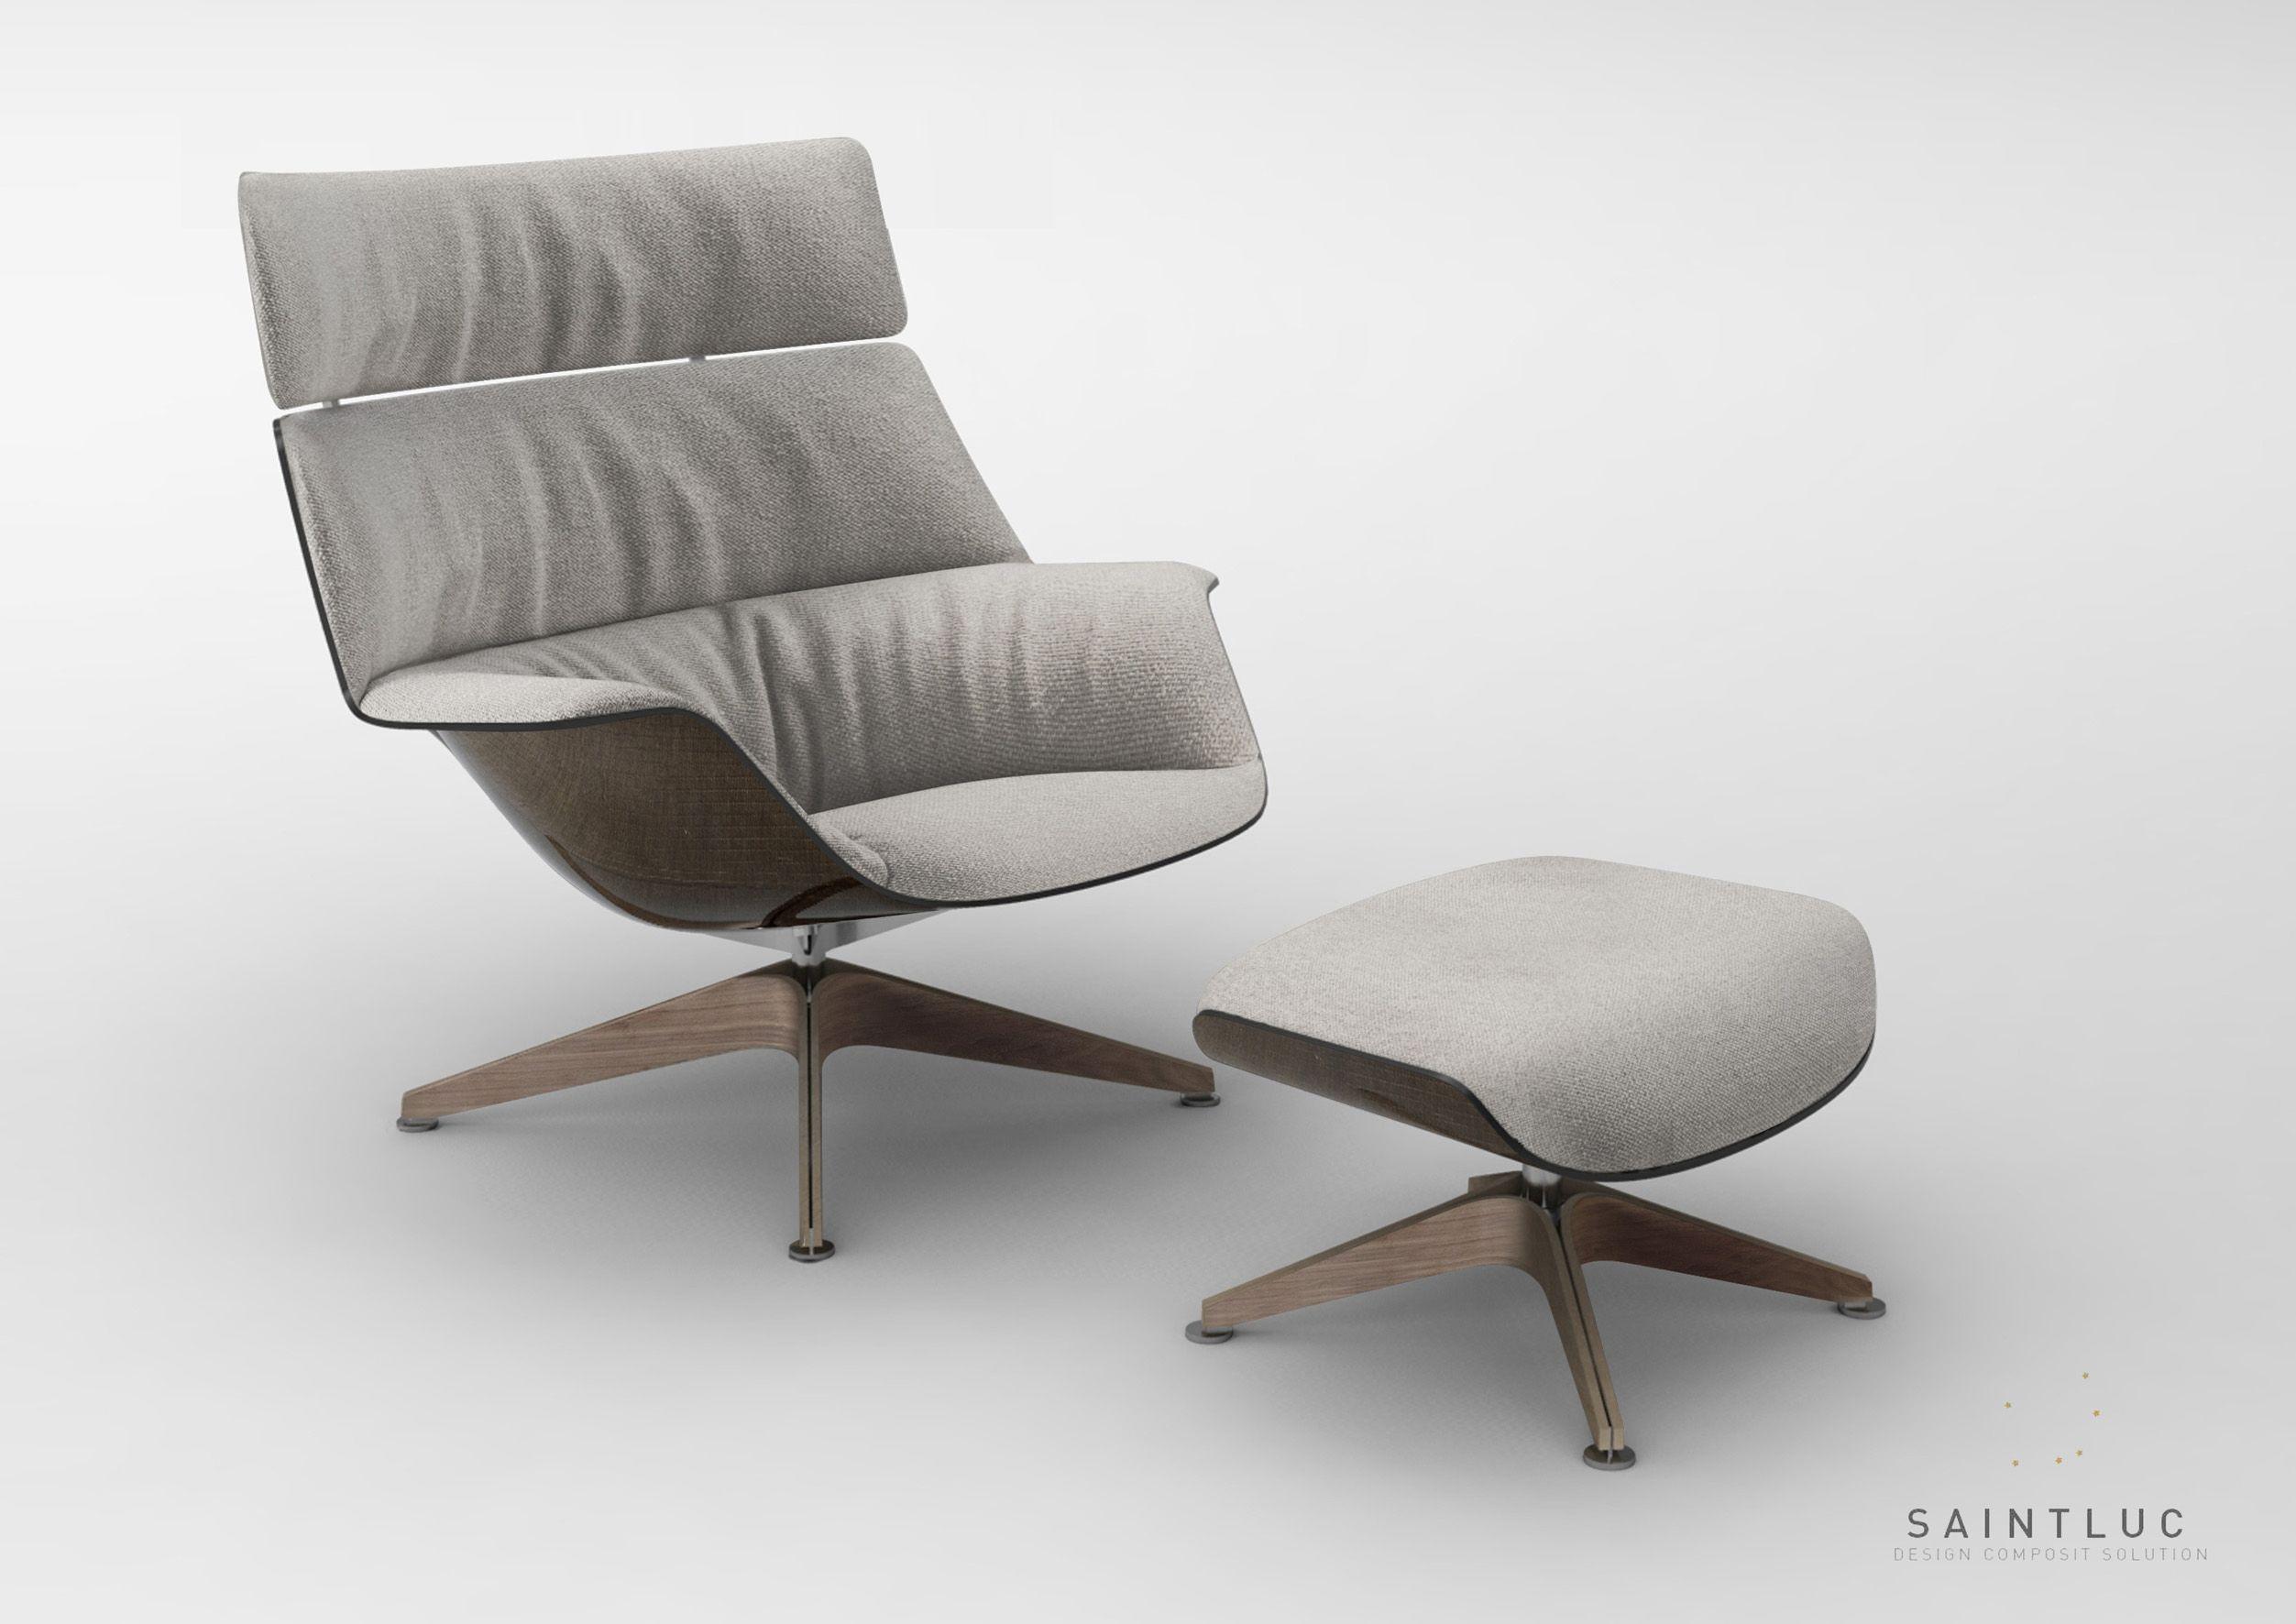 Massaud — Saint Luc fauteuil posite fibre de lin